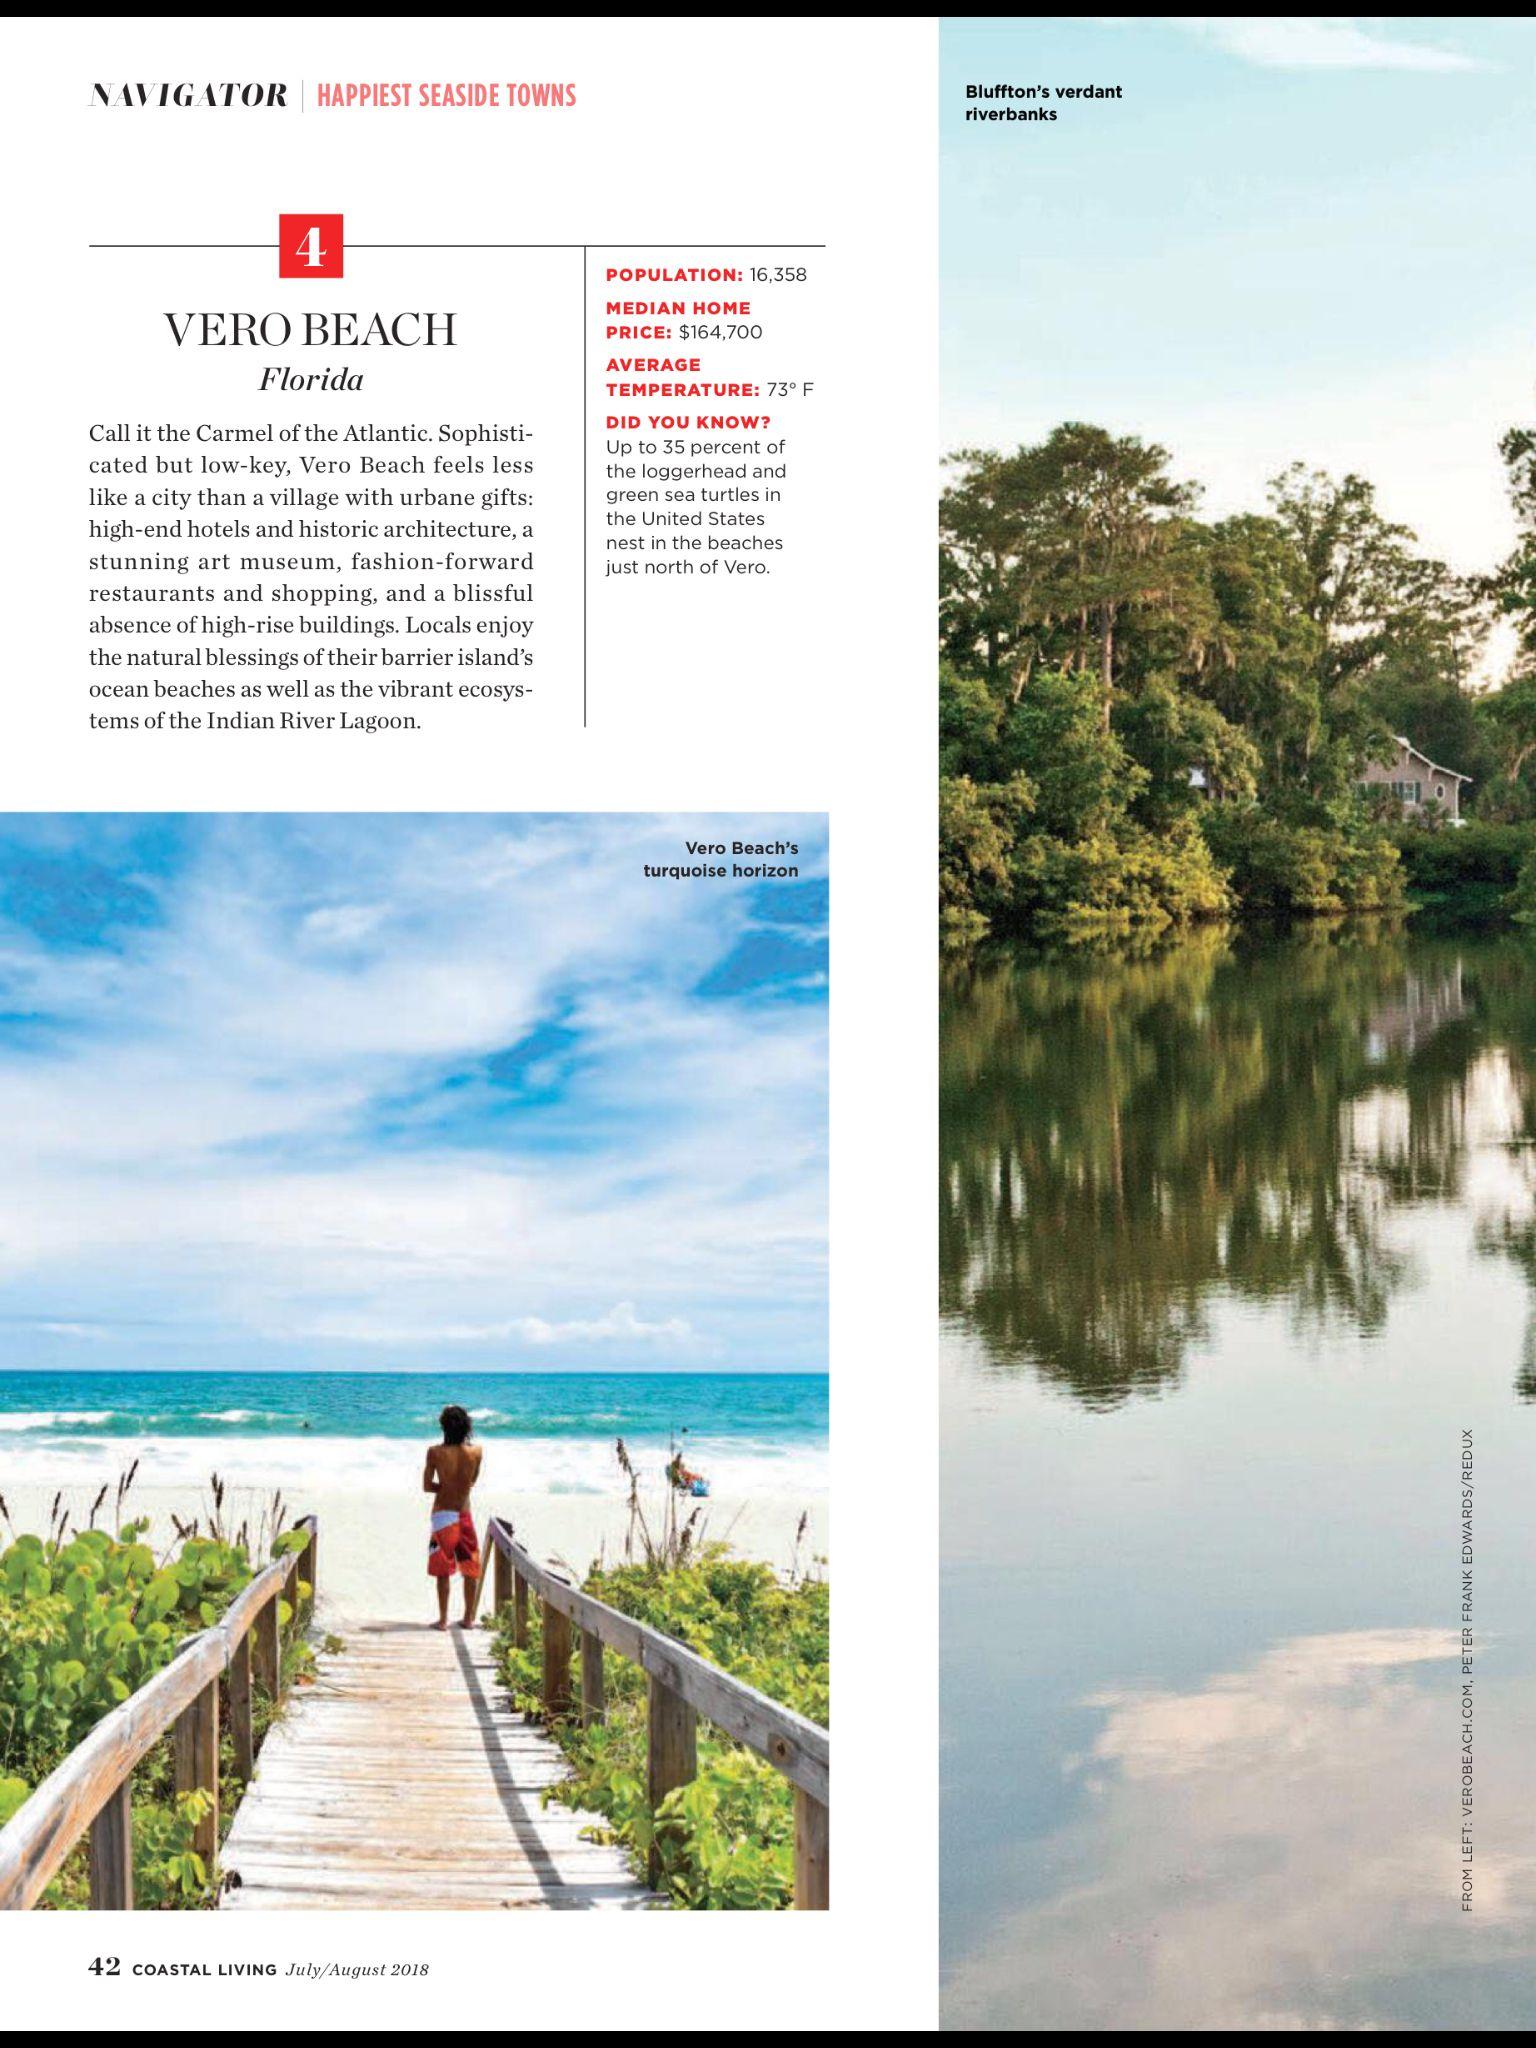 2018 america s happiest seaside towns from coastal living july rh pinterest com